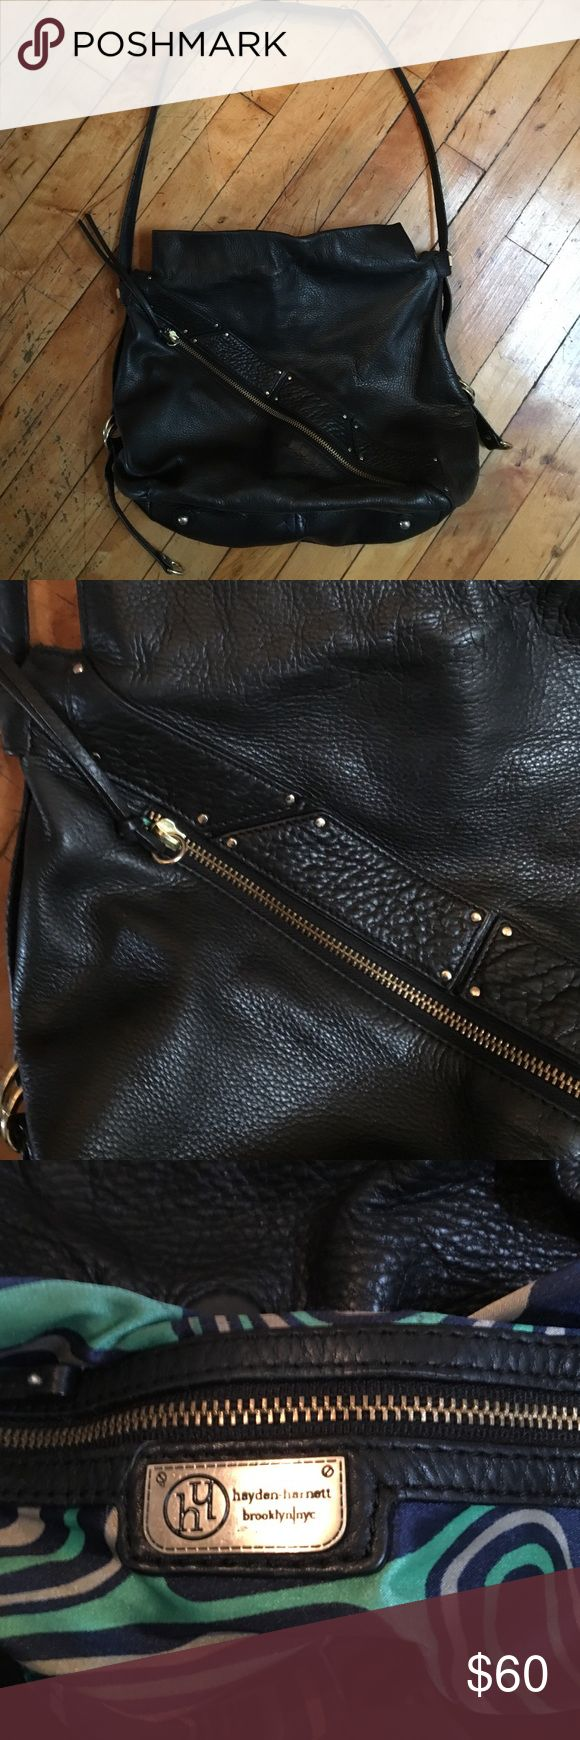 Hayden-Harnett Brooklyn leather bag Hayden Harnett black leather tote with asymmetrical gold zipper hayden harnett Bags Shoulder Bags